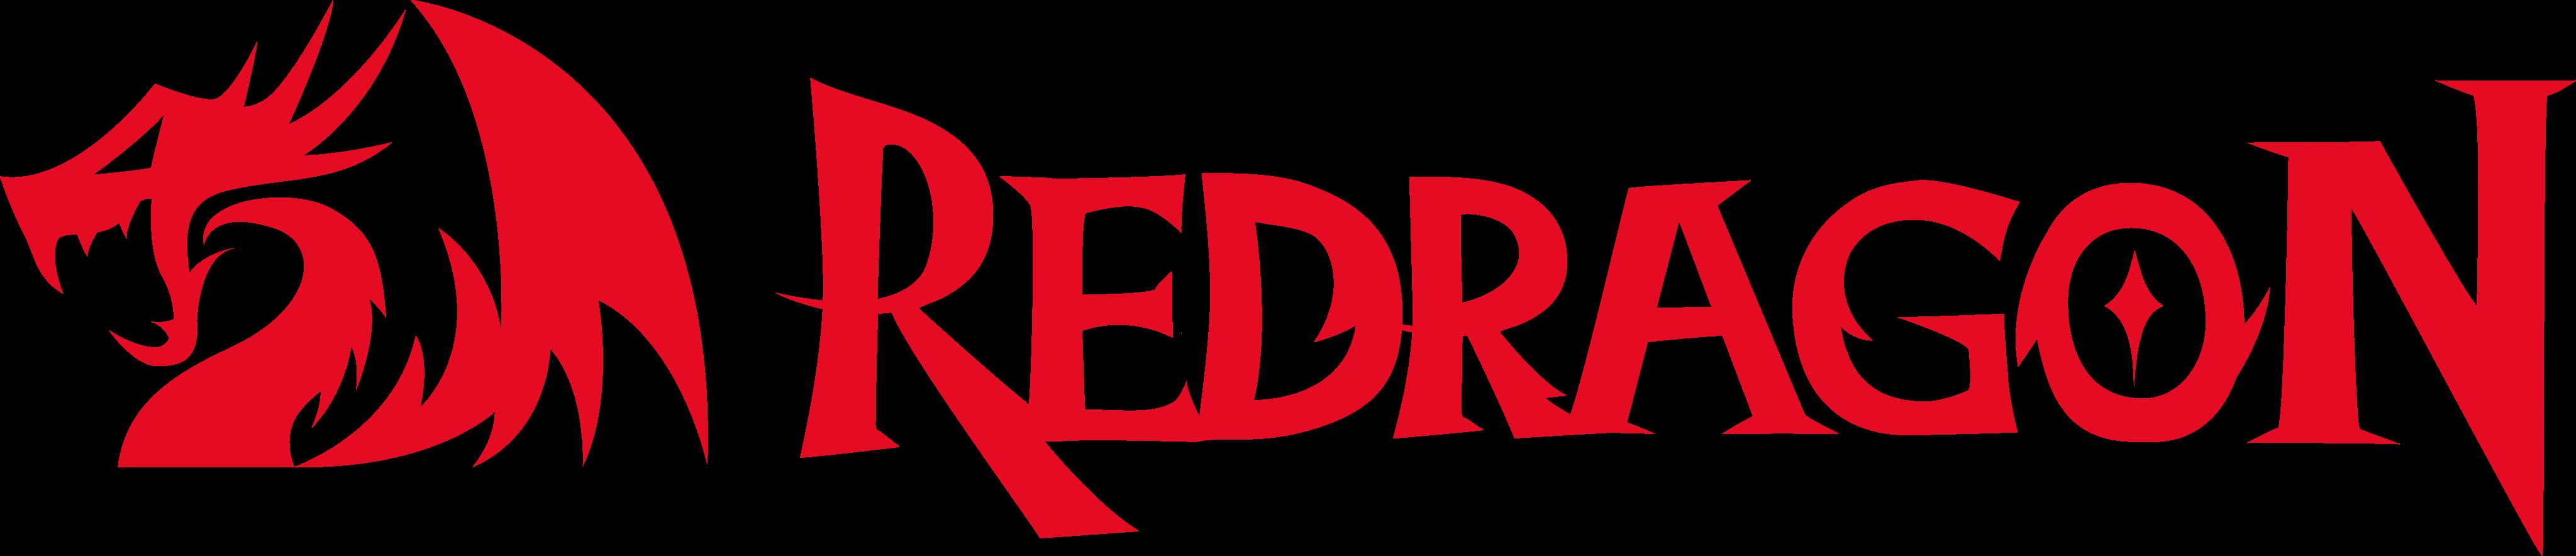 Redragon Logo.